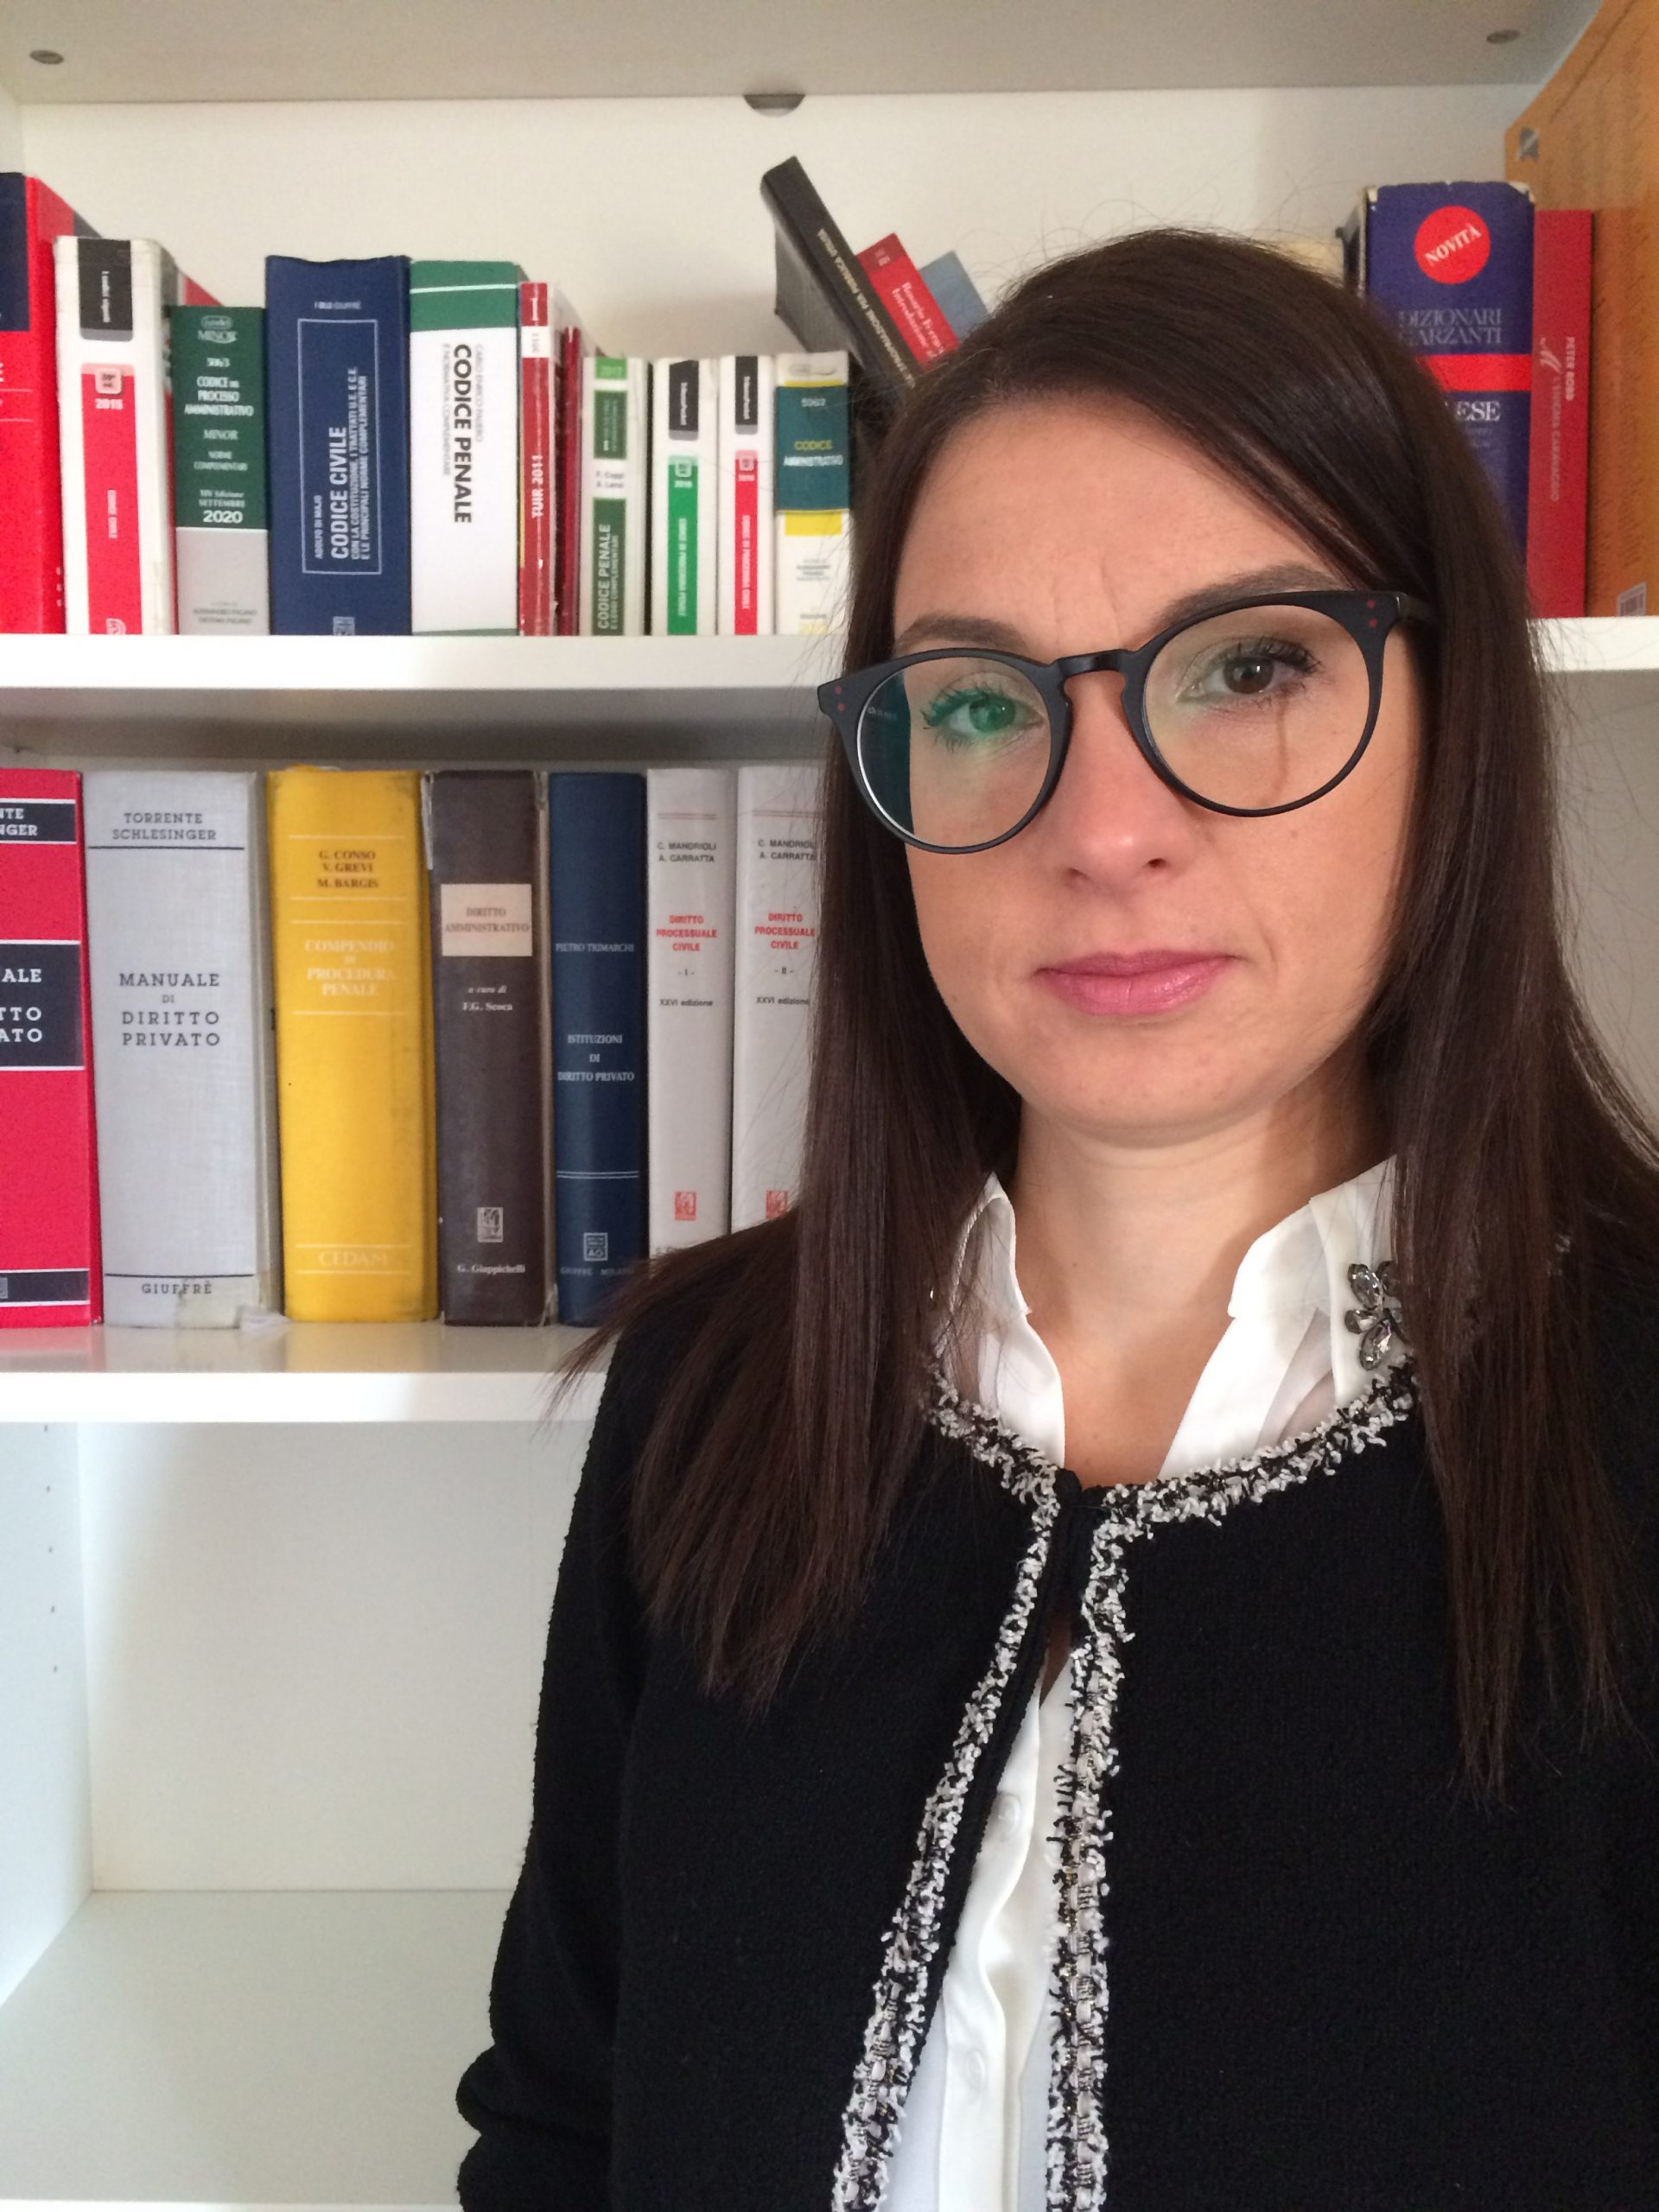 Serena Fiaschini